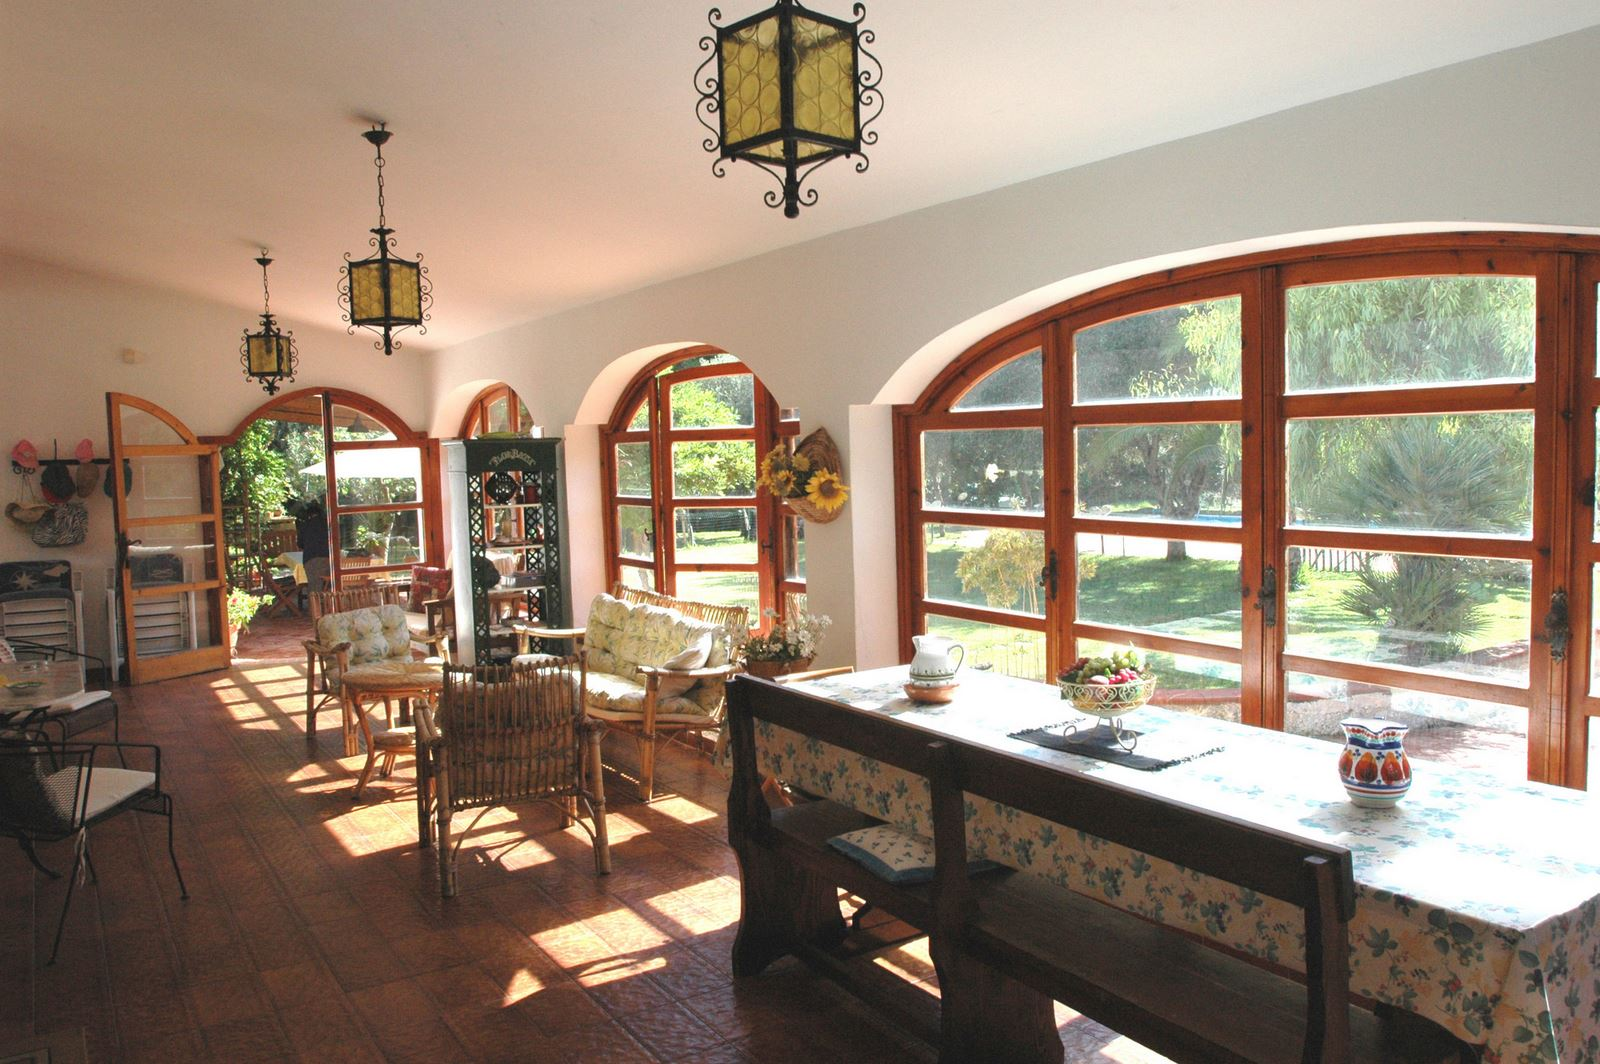 Maison de vacances Casa Fanusa (870904), Siracusa, Siracusa, Sicile, Italie, image 10